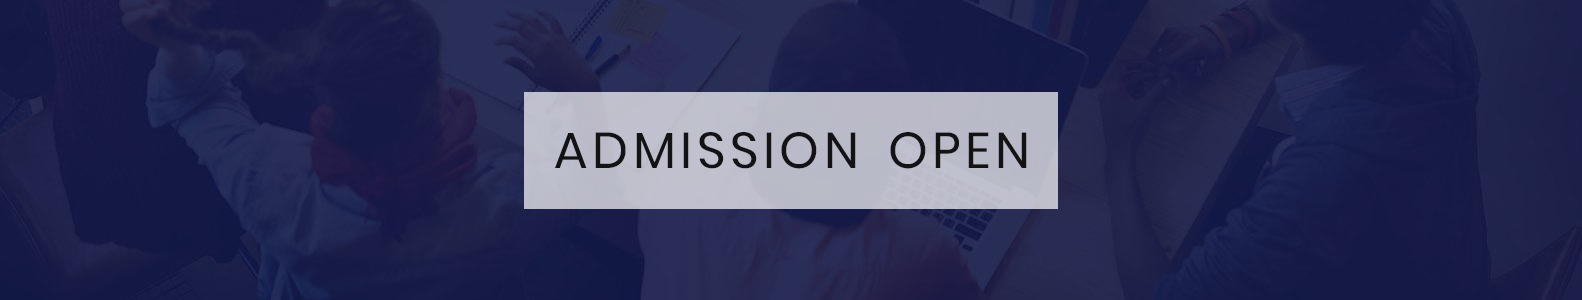 Admission banner